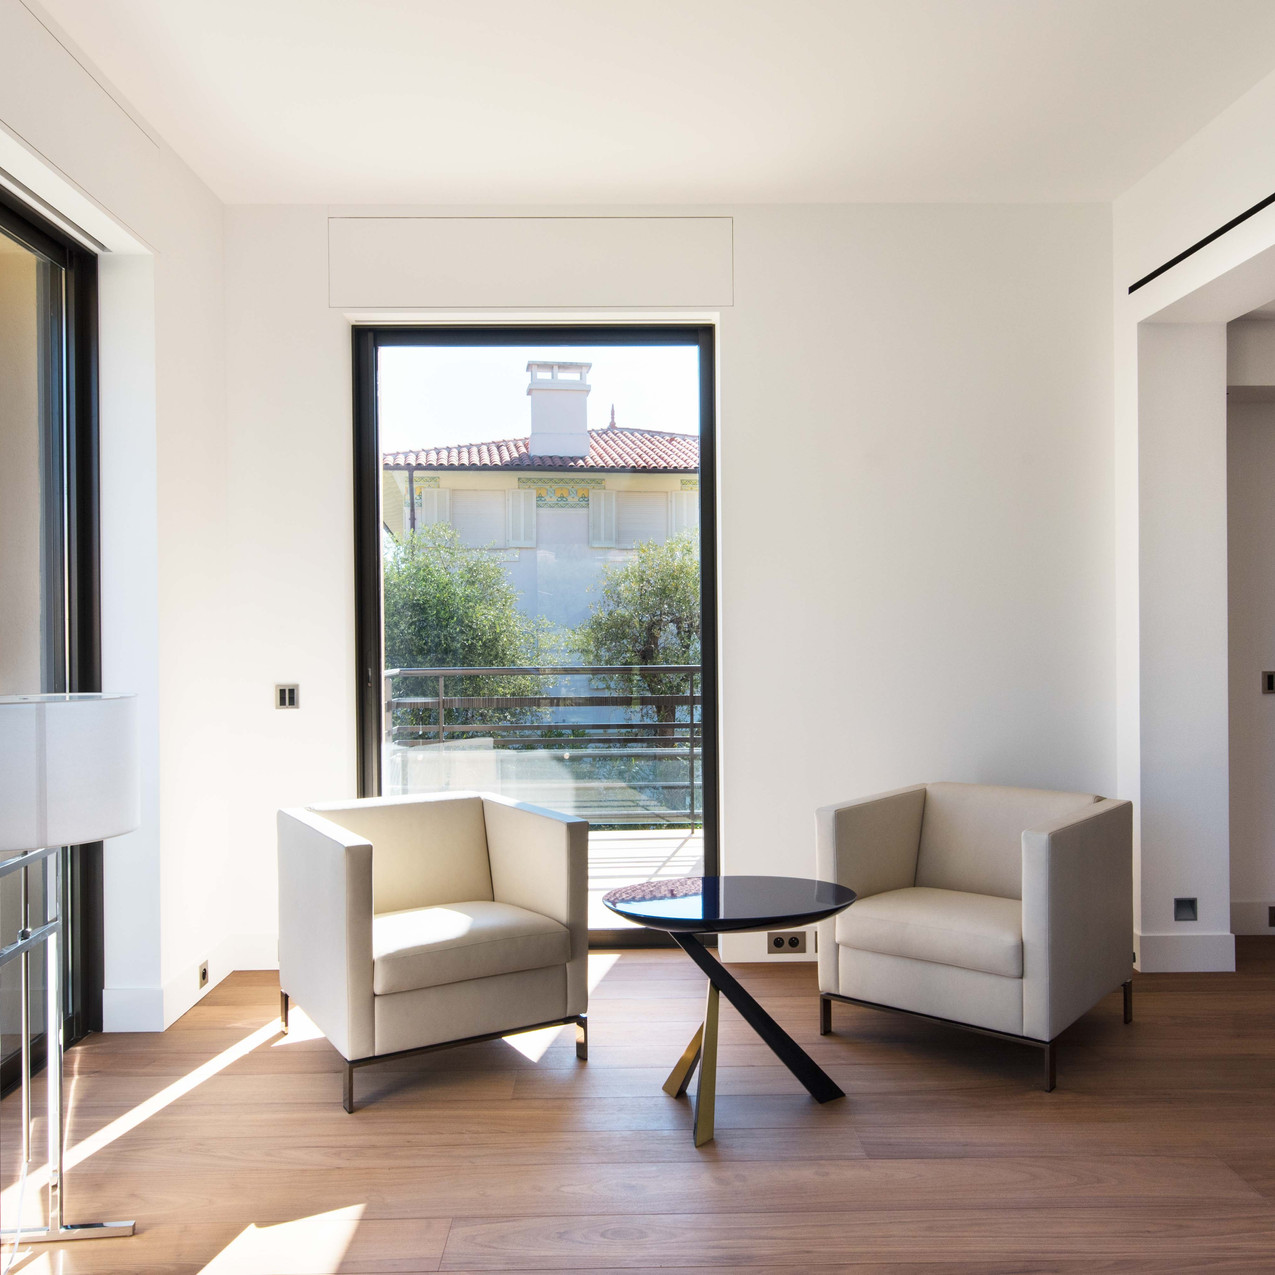 photographe architecture nice france french riviera paca cote dazur interieur-2